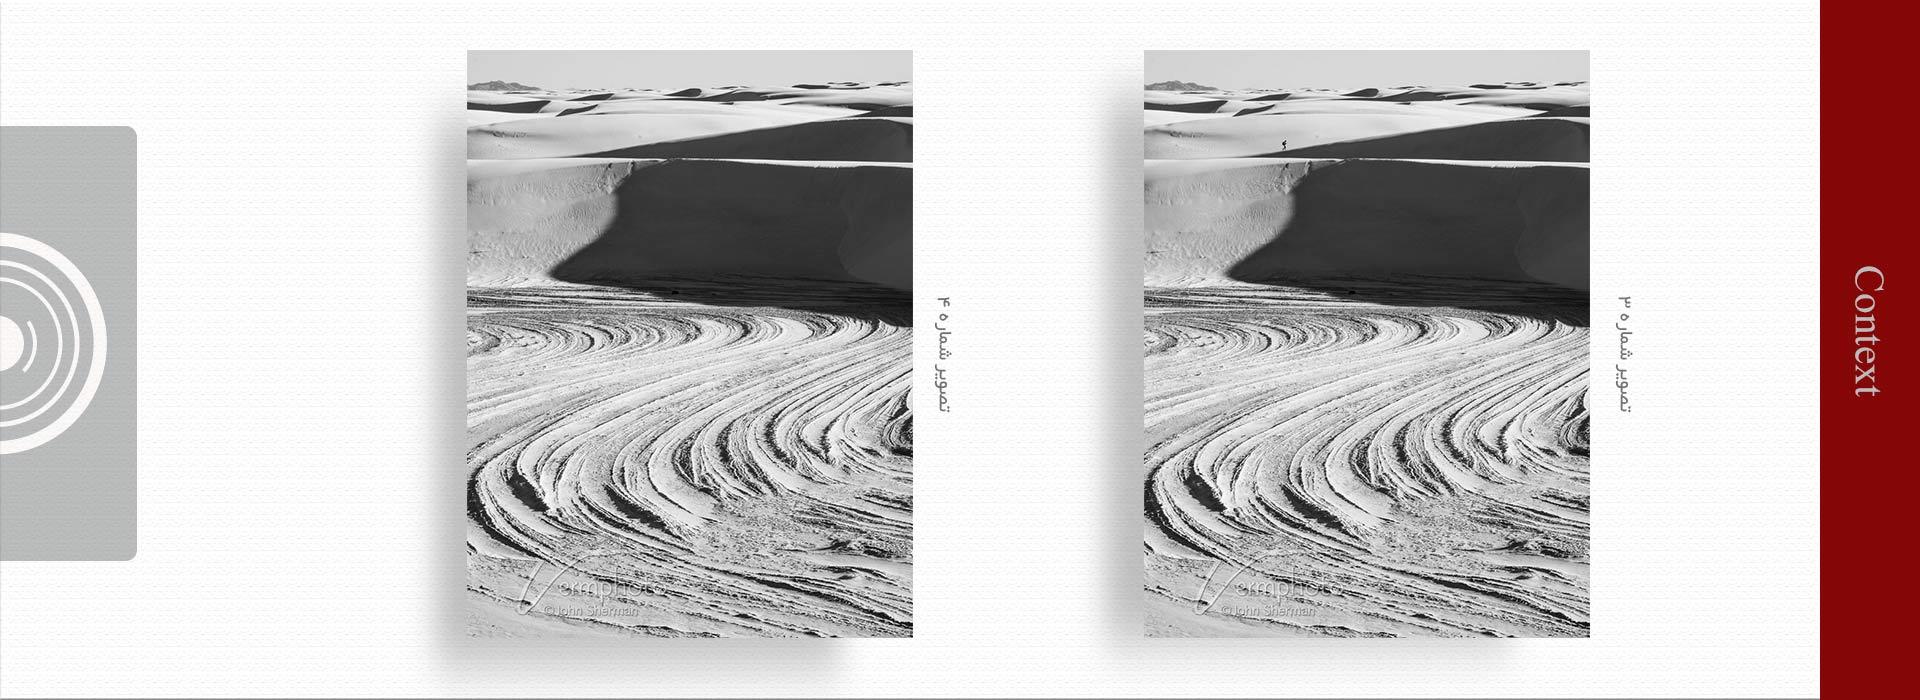 context in photography 2 - مهمترین ویژگی های عکس خوب چیست ؟